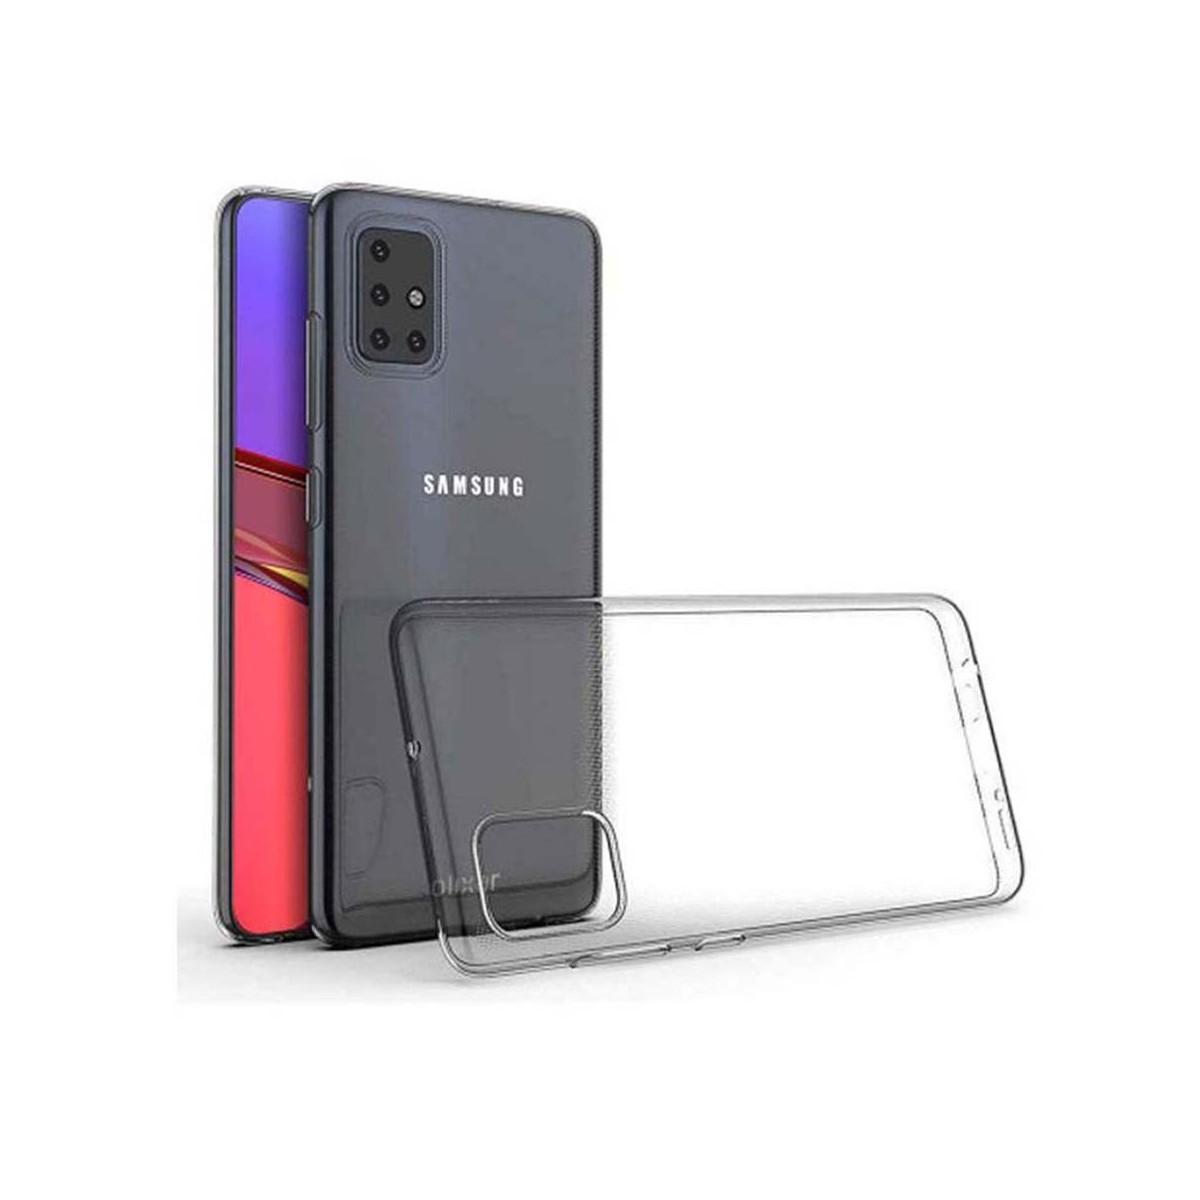 Akami Coque Samsung Galaxy A51 Transparente en silicone de haute qualité